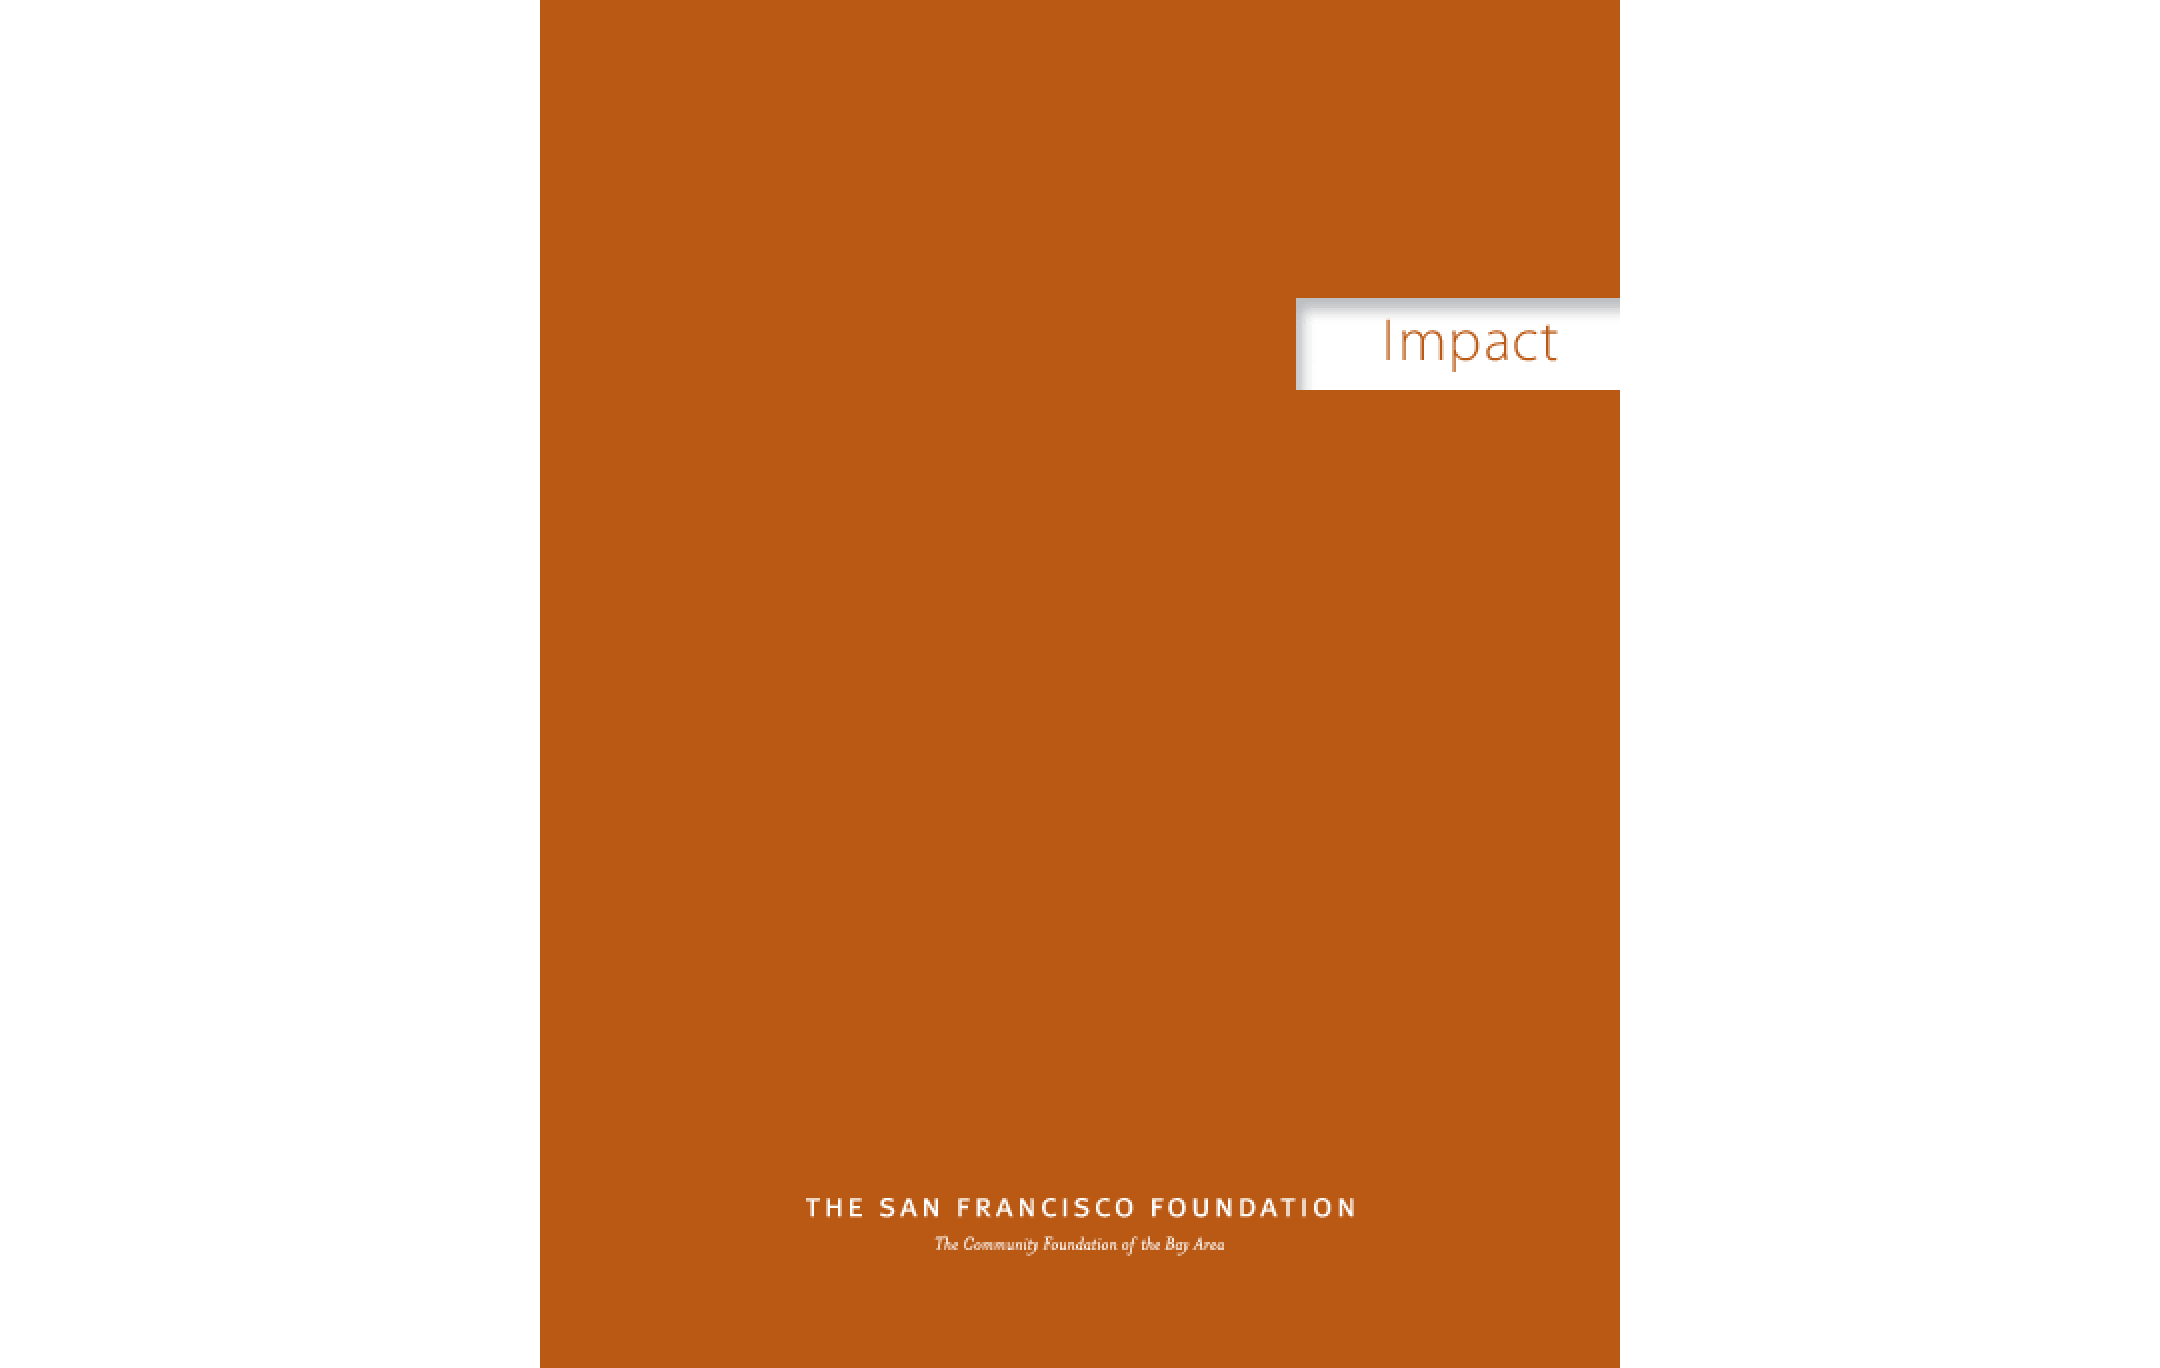 San Francisco Foundation - 2008 Annual Report: Impact